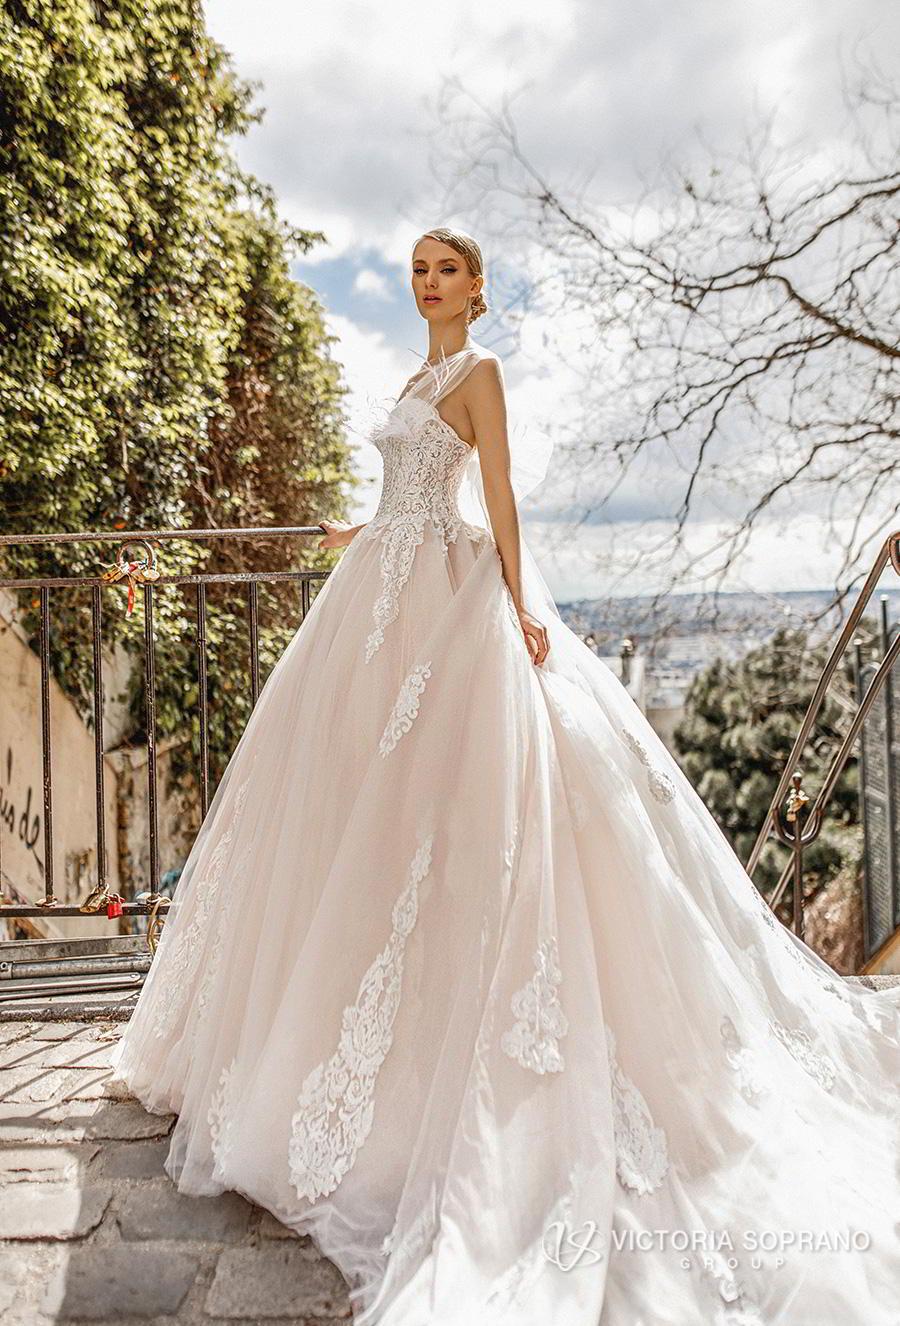 victoria soprano 2019 bridal sleeveless sheer strap sweetheart neckline heavily embellished bodice princess blush ball gown wedding dress royal train (jakline) sdv